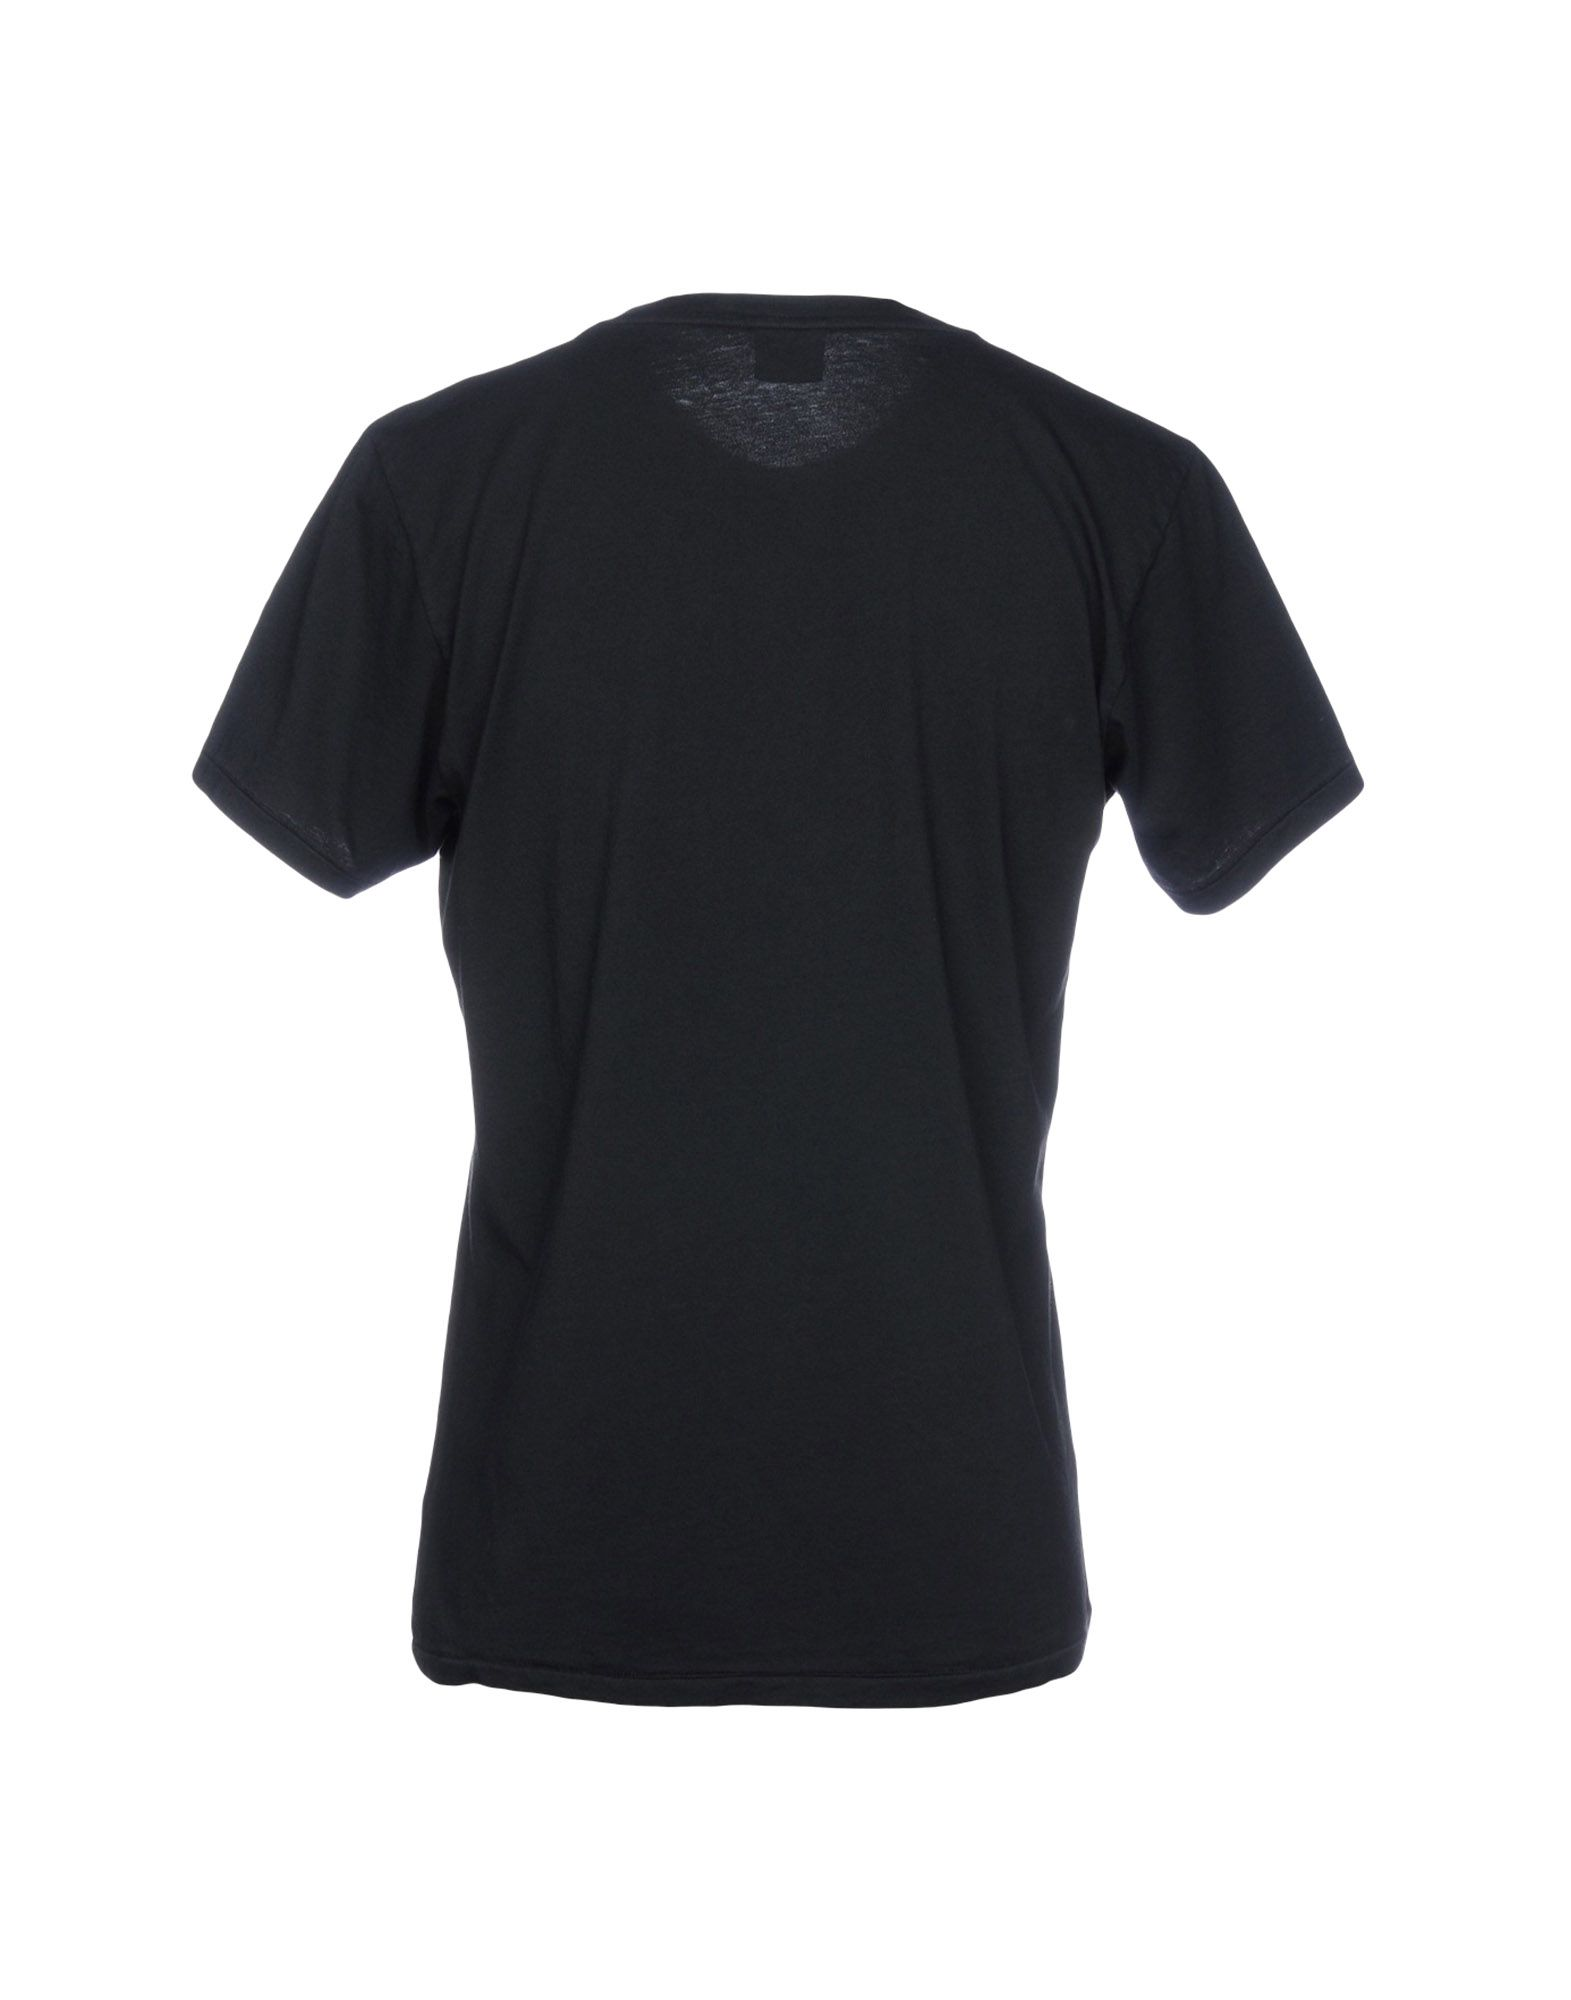 A buon mercato A buon mercato T-Shirt T-Shirt mercato Uniform Uomo - 12196127QB 113aab